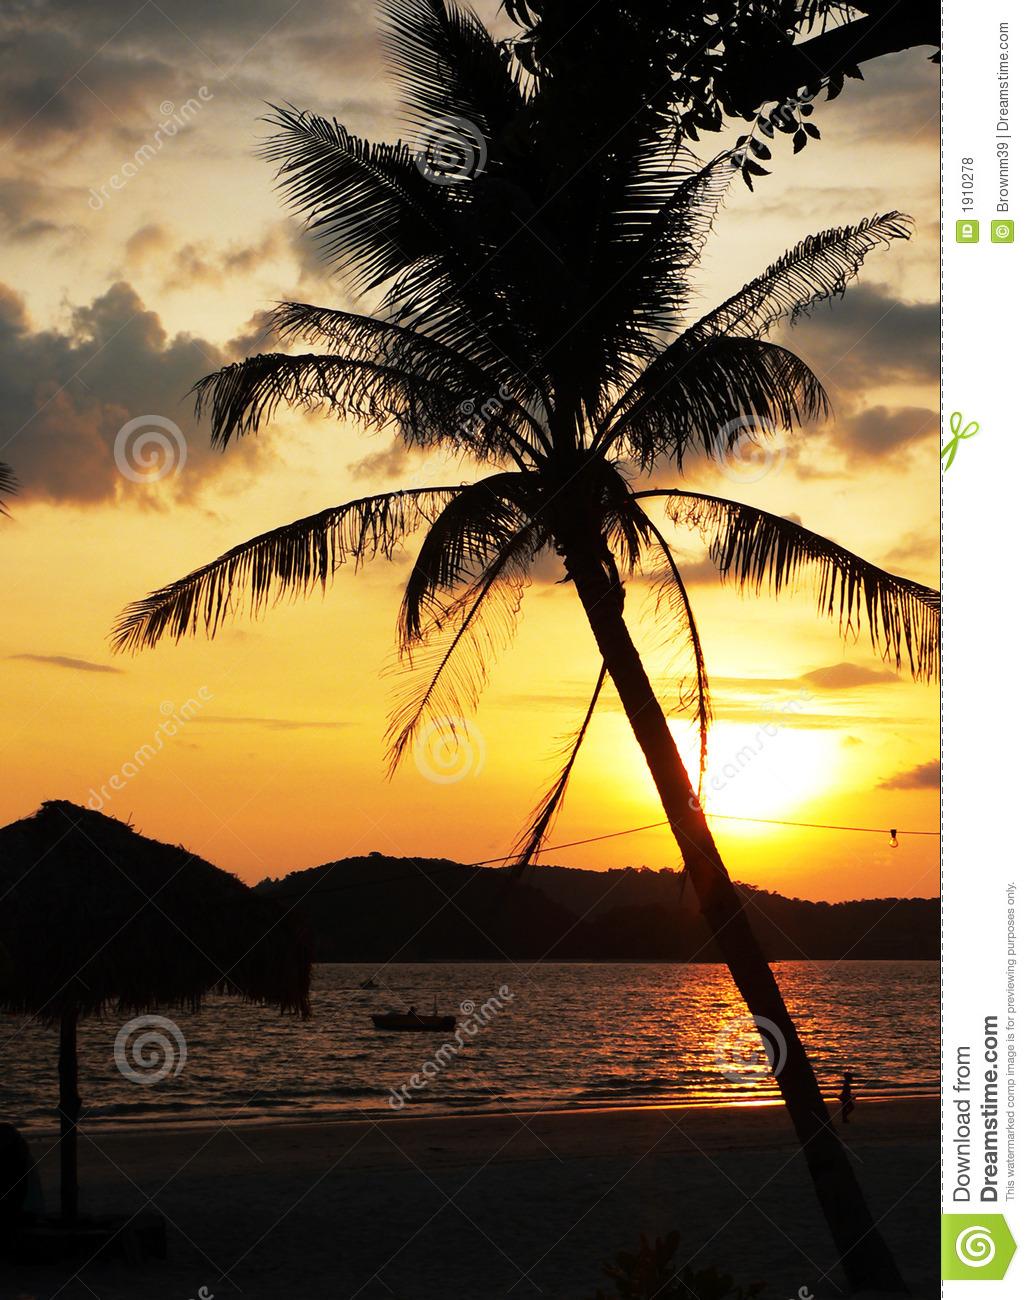 Langkawi Island clipart #5, Download drawings